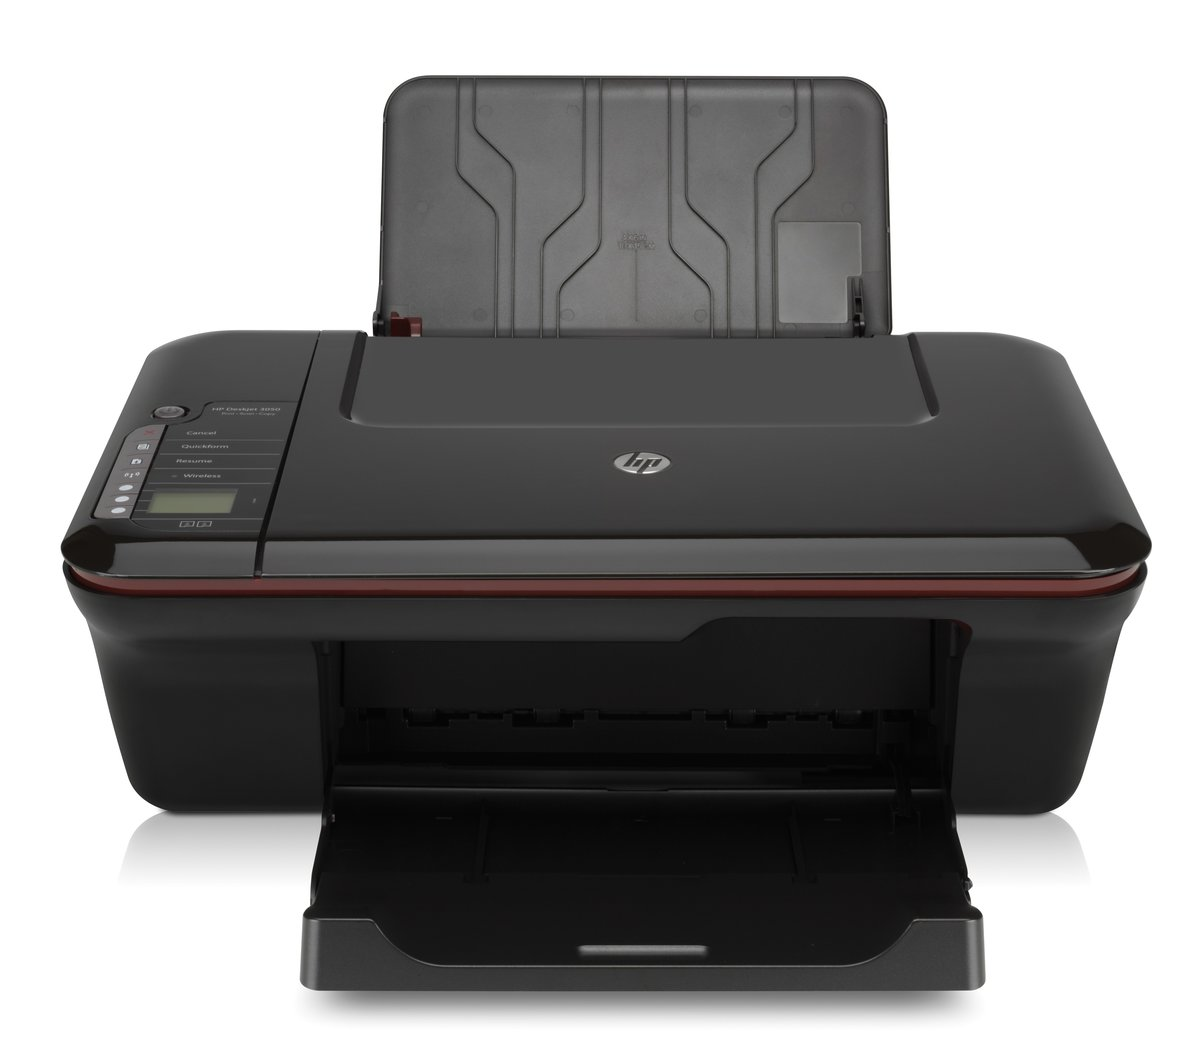 Robust Hp Deskjet Multiction Printer Currys Pc World Business Hp Deskjet Multiction Printer Hp Deskjet 2050 J510 How To Scan Multiple Pages Hp Deskjet 2050 J510 Manual dpreview Hp Deskjet 2050 J510